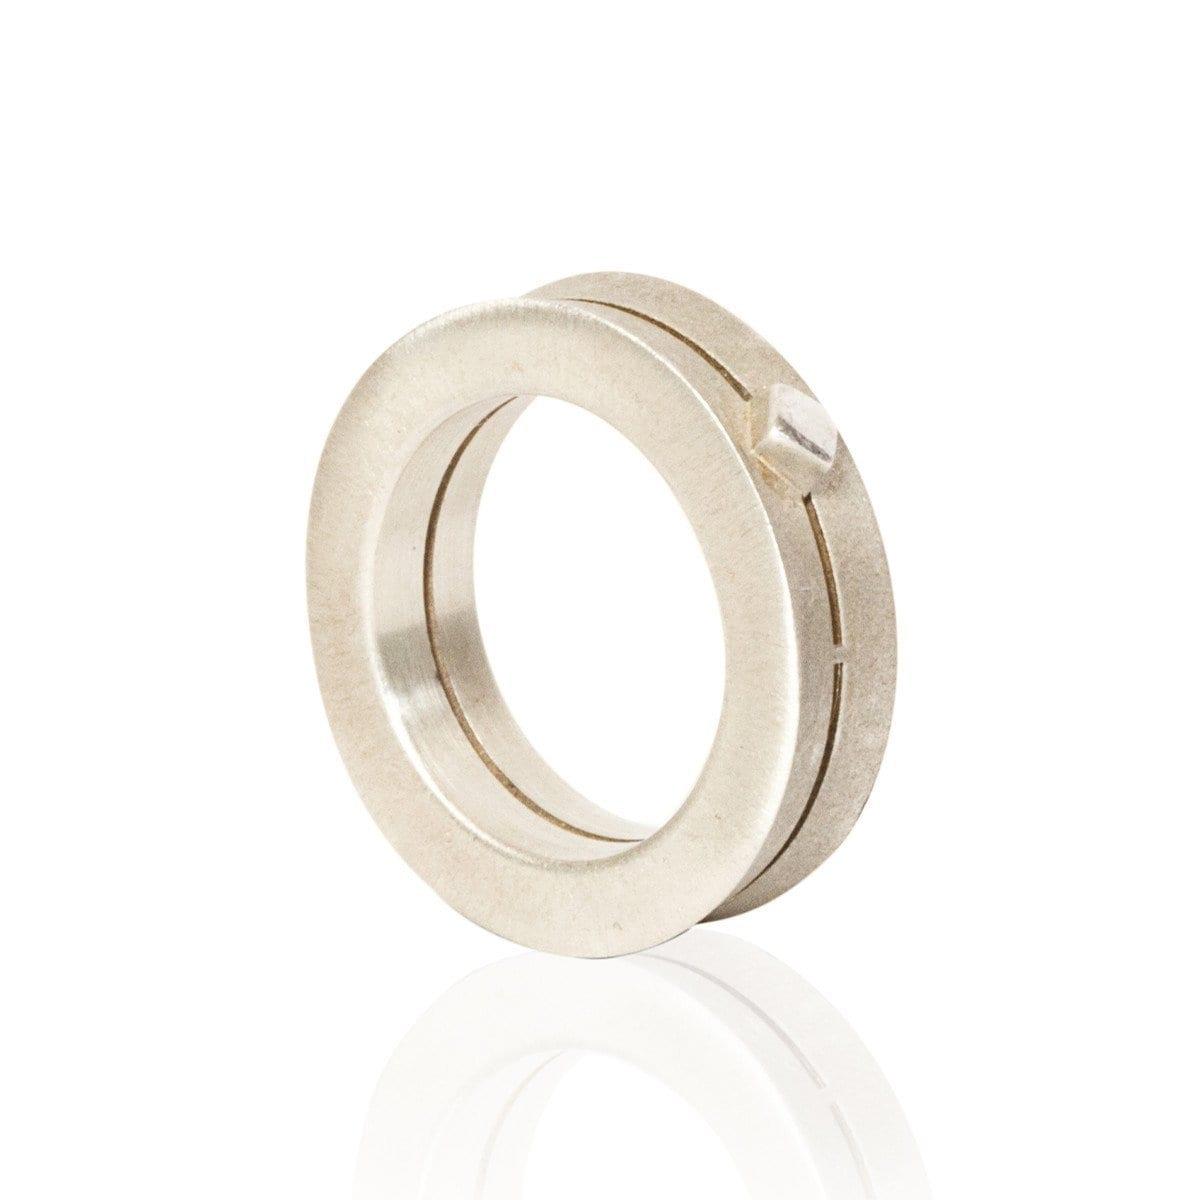 The Keystone Ring